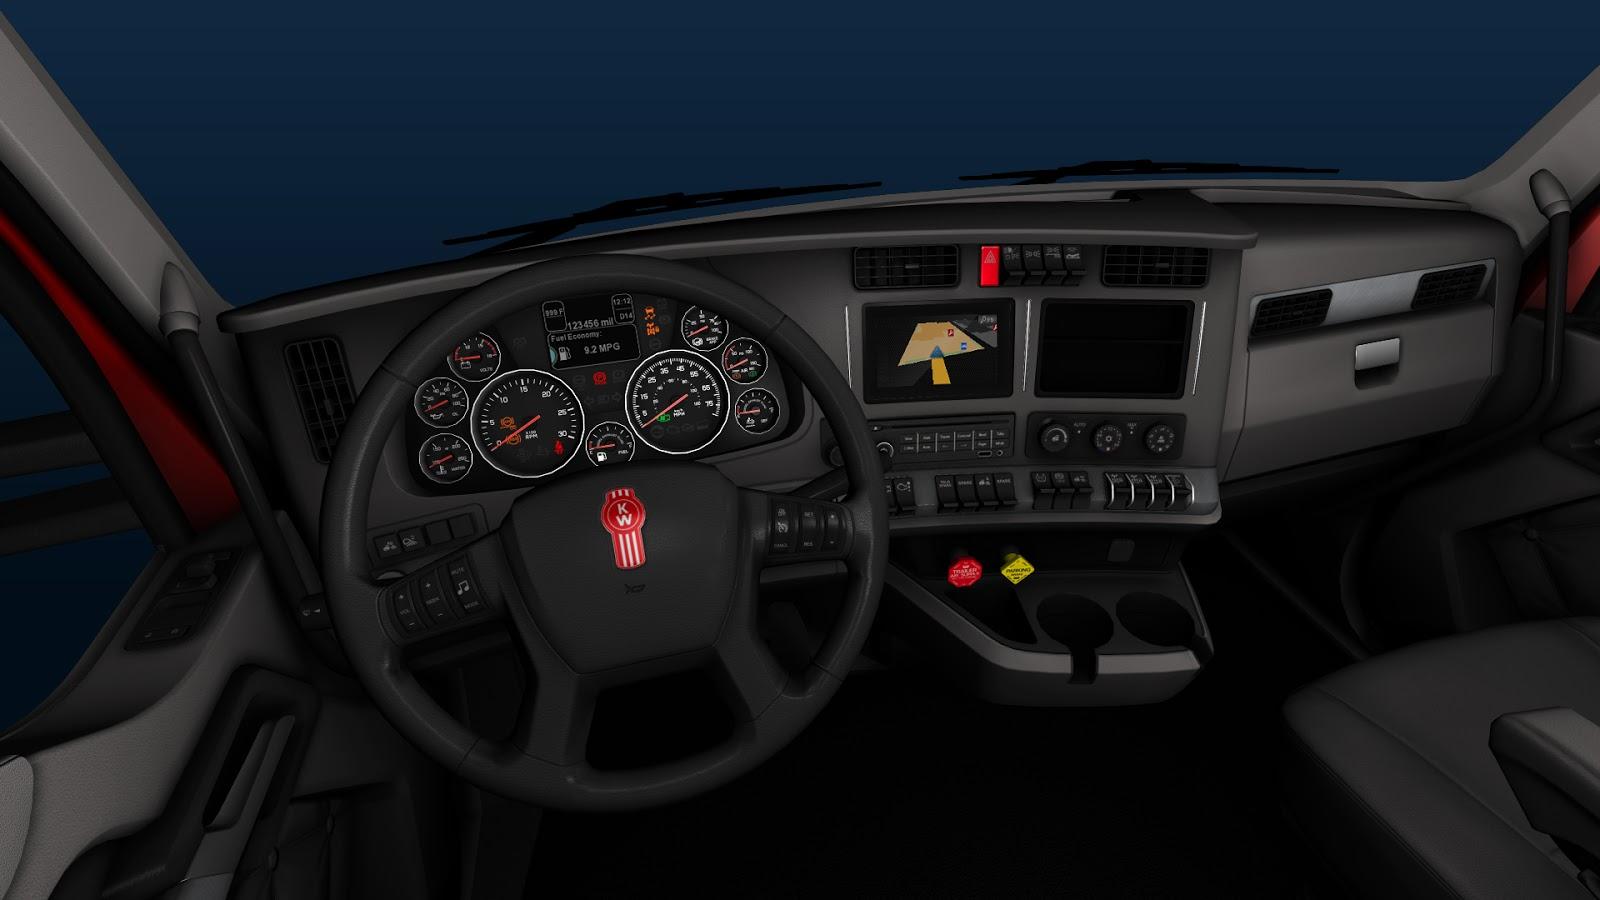 Kenworth T680 Truck Interior In American Truck Simulator Game Ats Mod American Truck